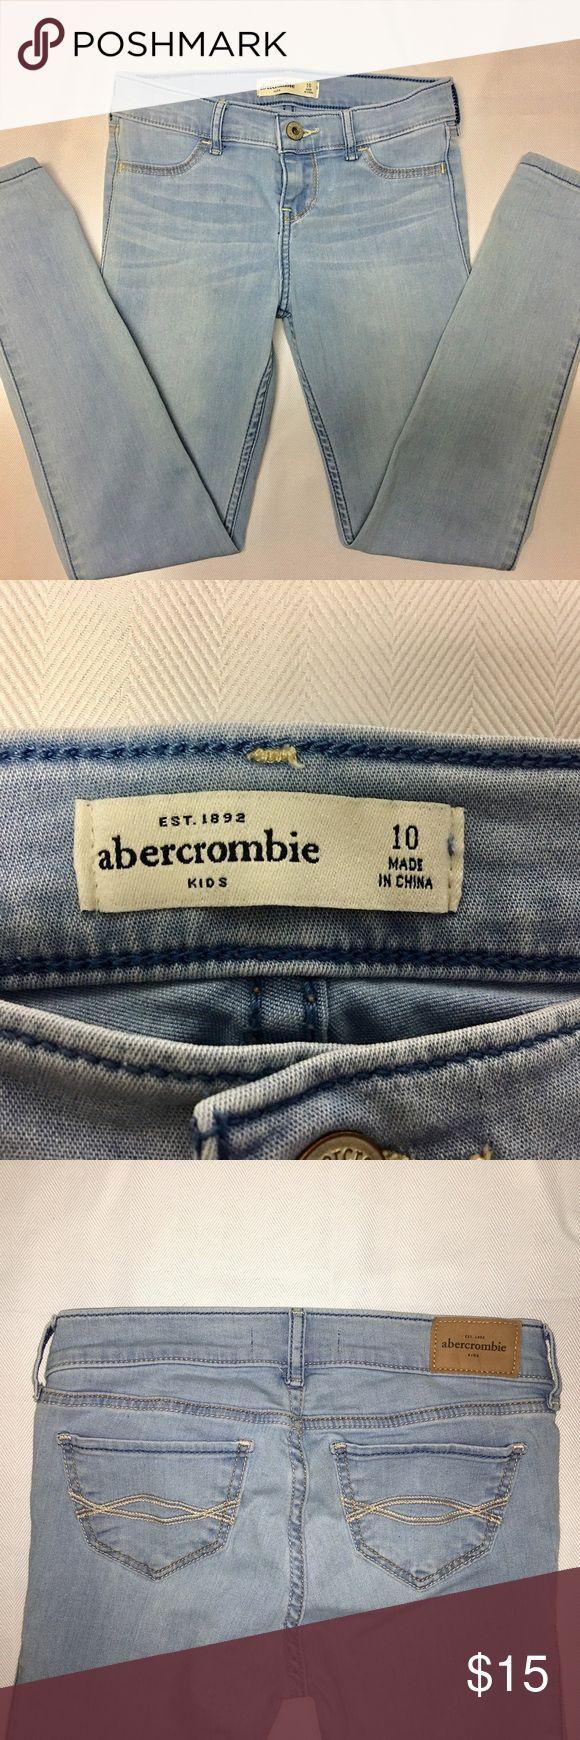 Girl's Abercrombie jeans (10) Girl's Abercrombie jeans (10) abercrombie kids Bottoms Jeans